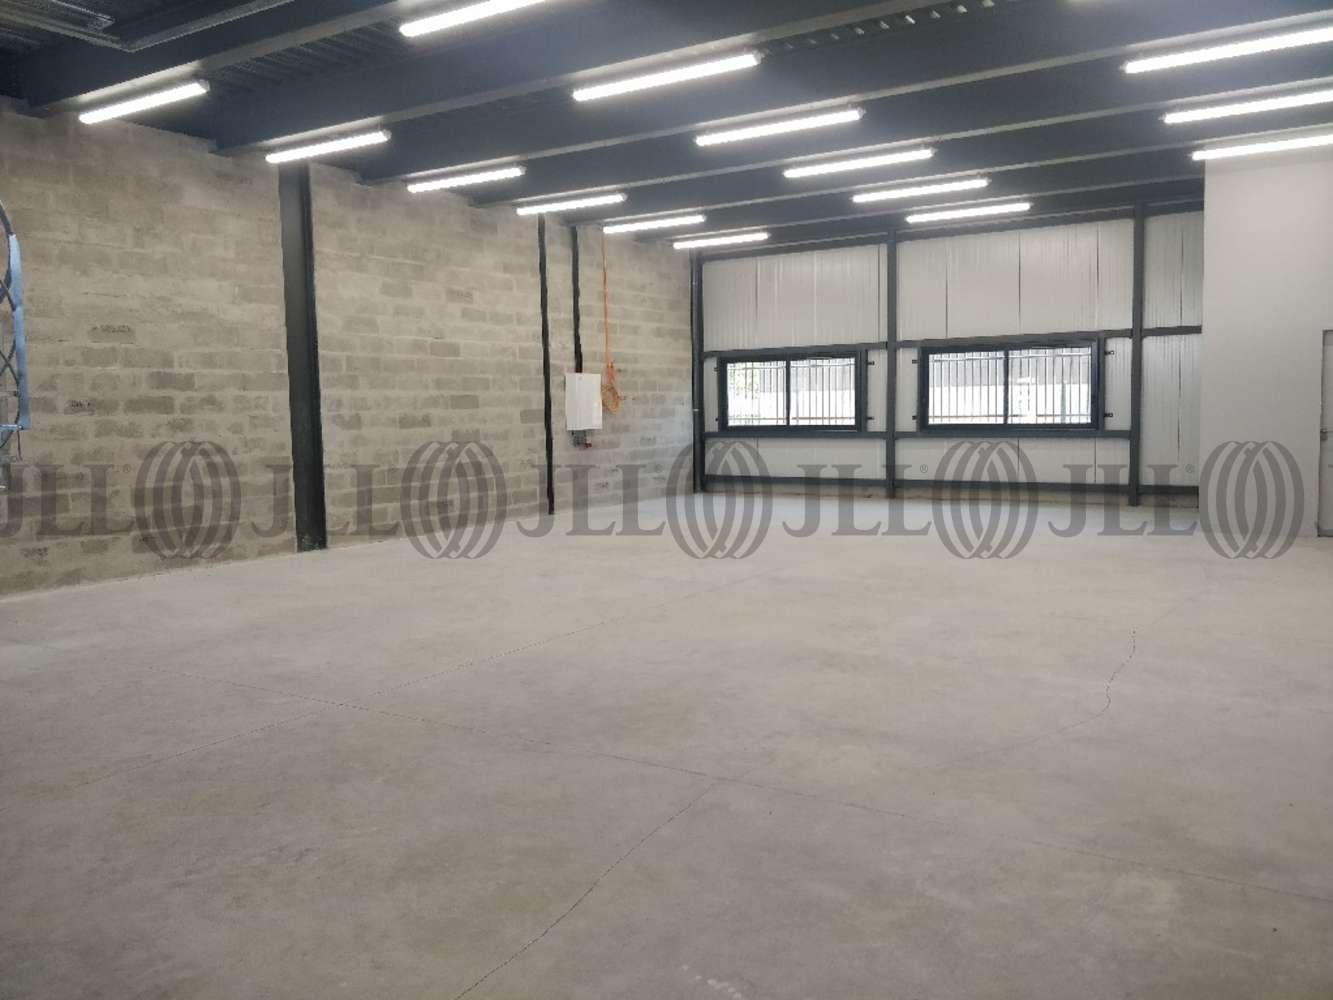 Activités/entrepôt Bois d arcy, 78390 - 2 RUE CAMELINAT